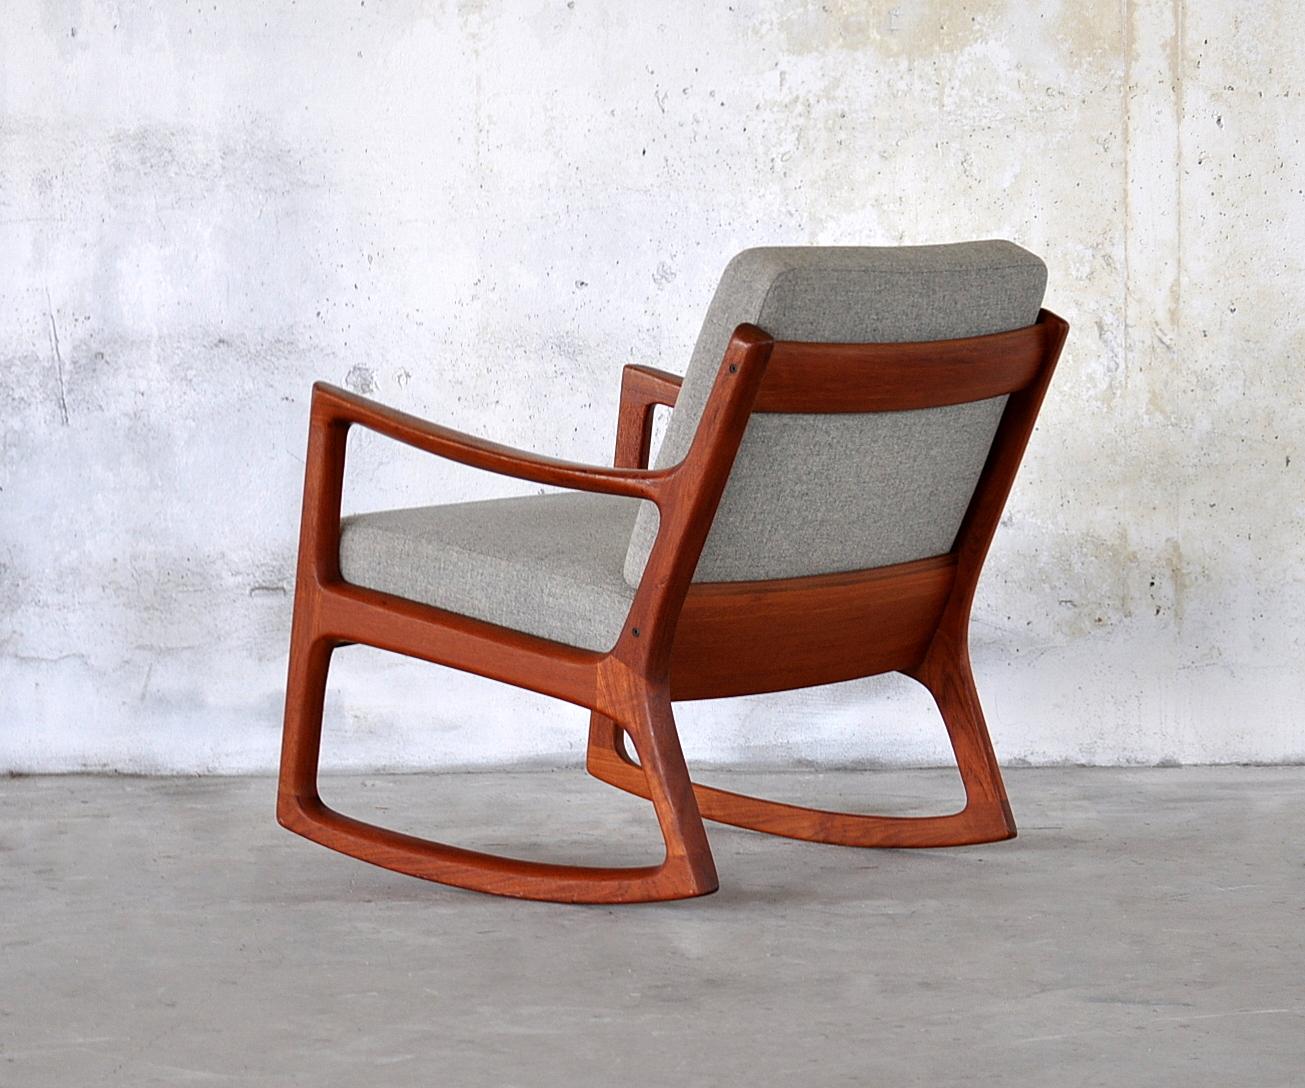 Rocking Chair Inspiration furniture. modern rocking chair inspiring ... QUJMIHZ